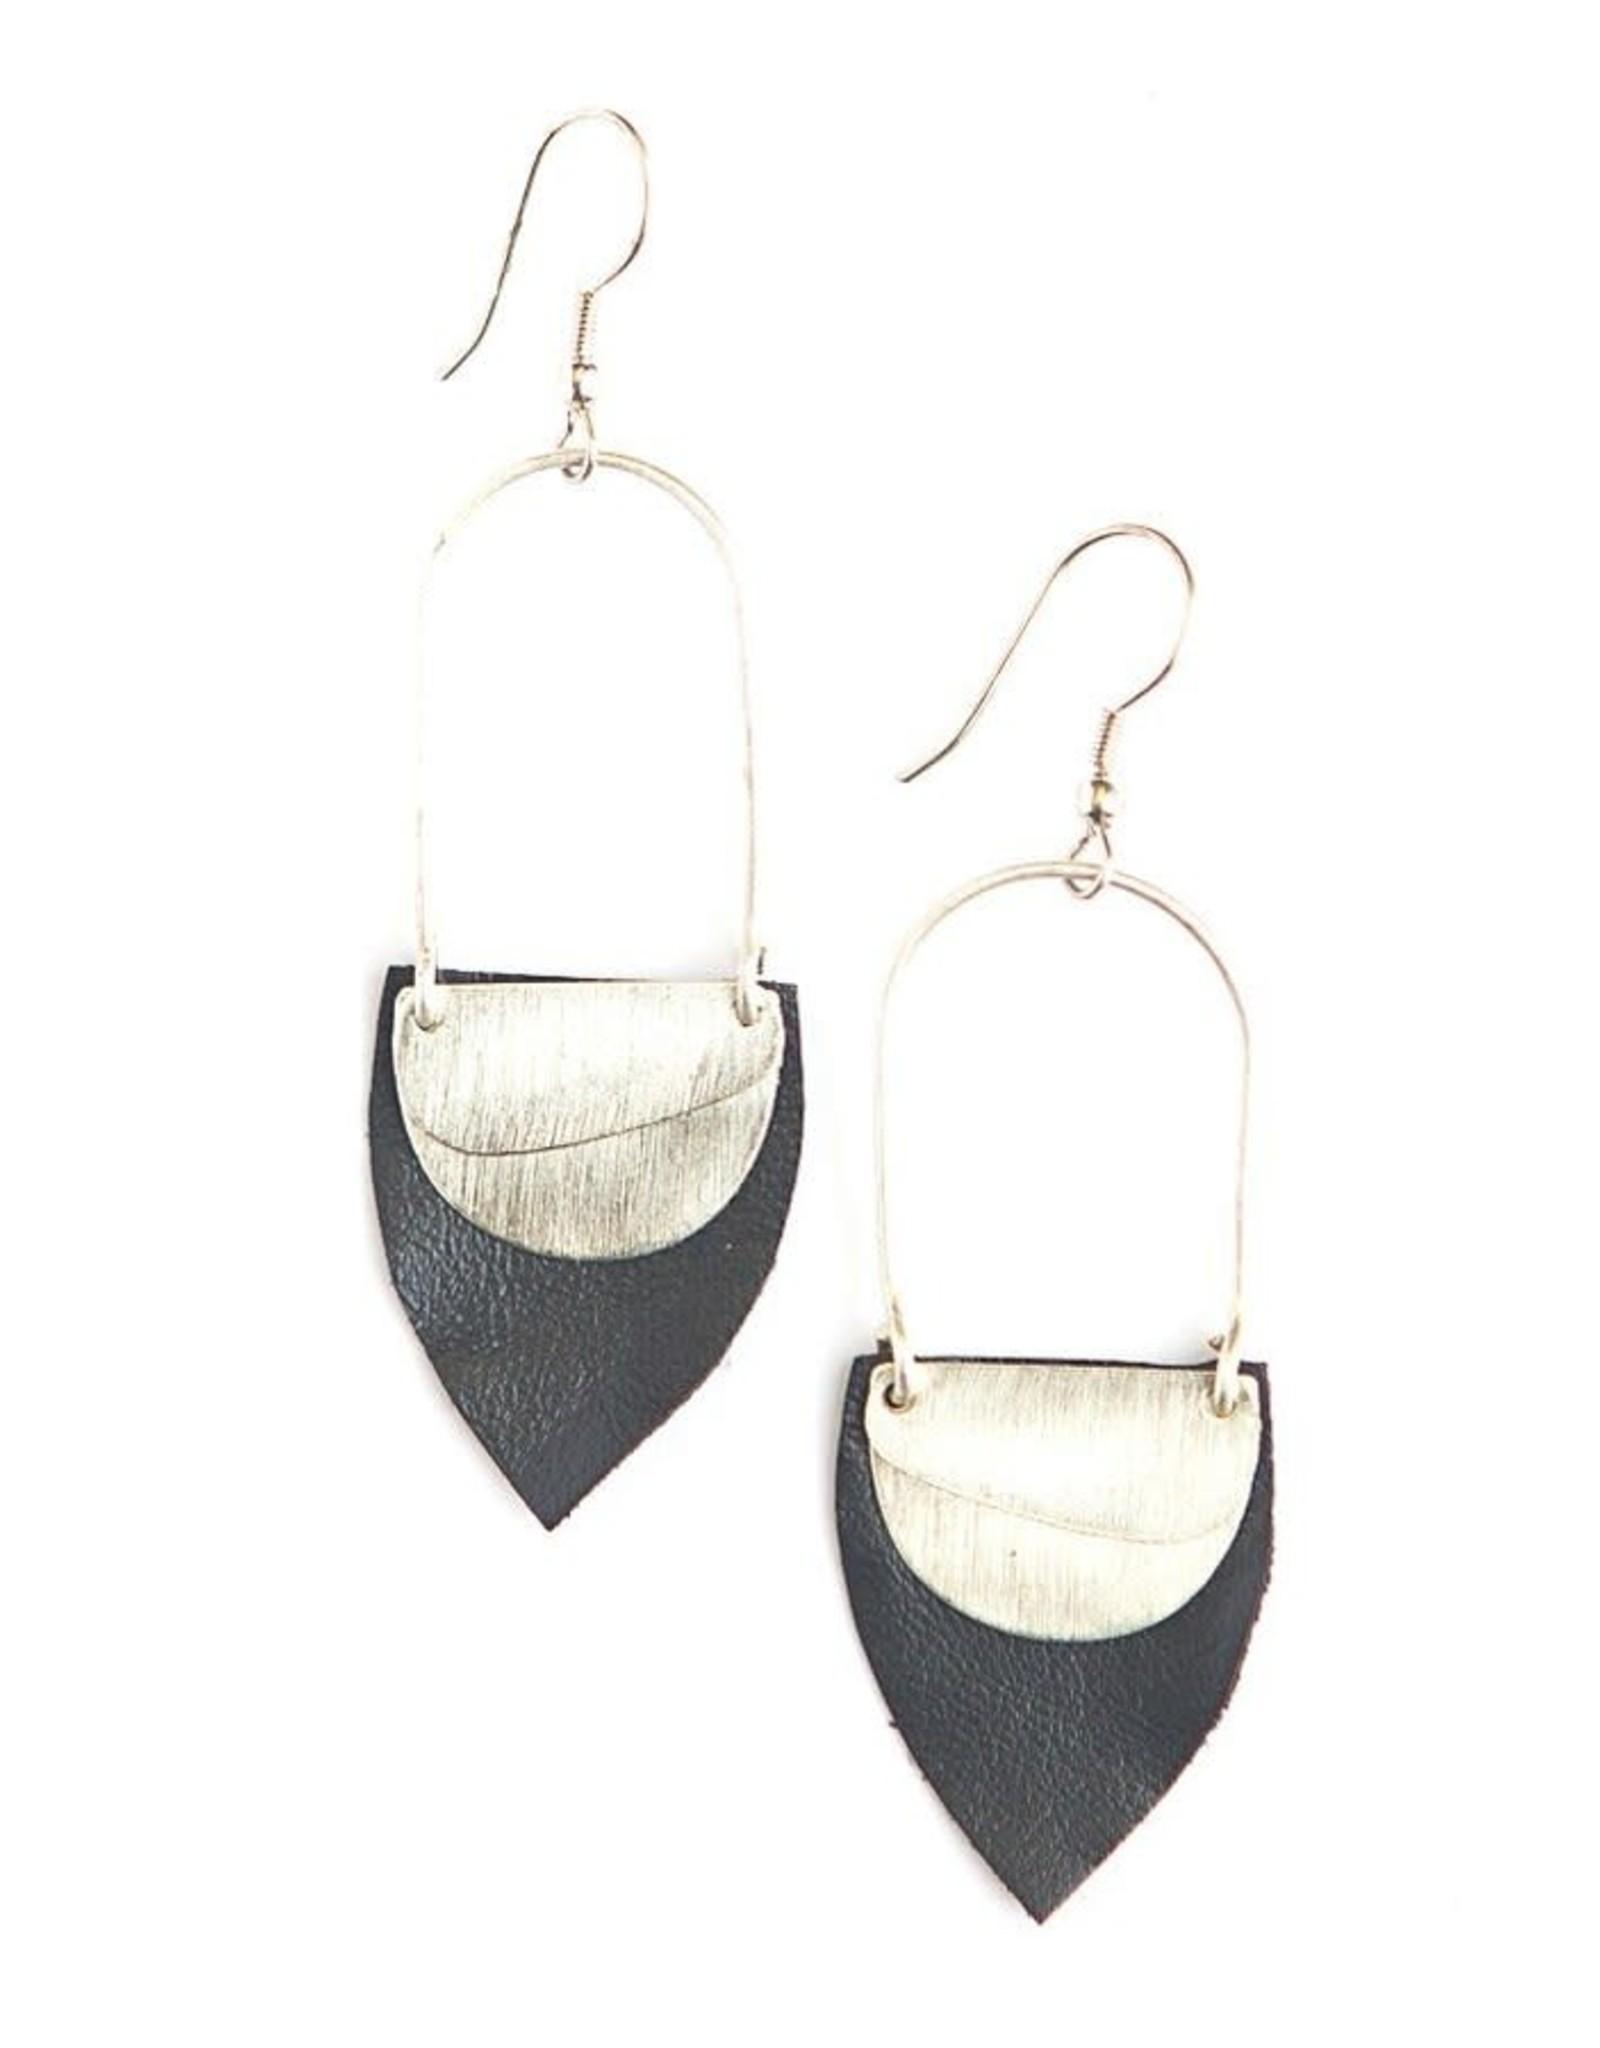 Trailblazer Earrings, India